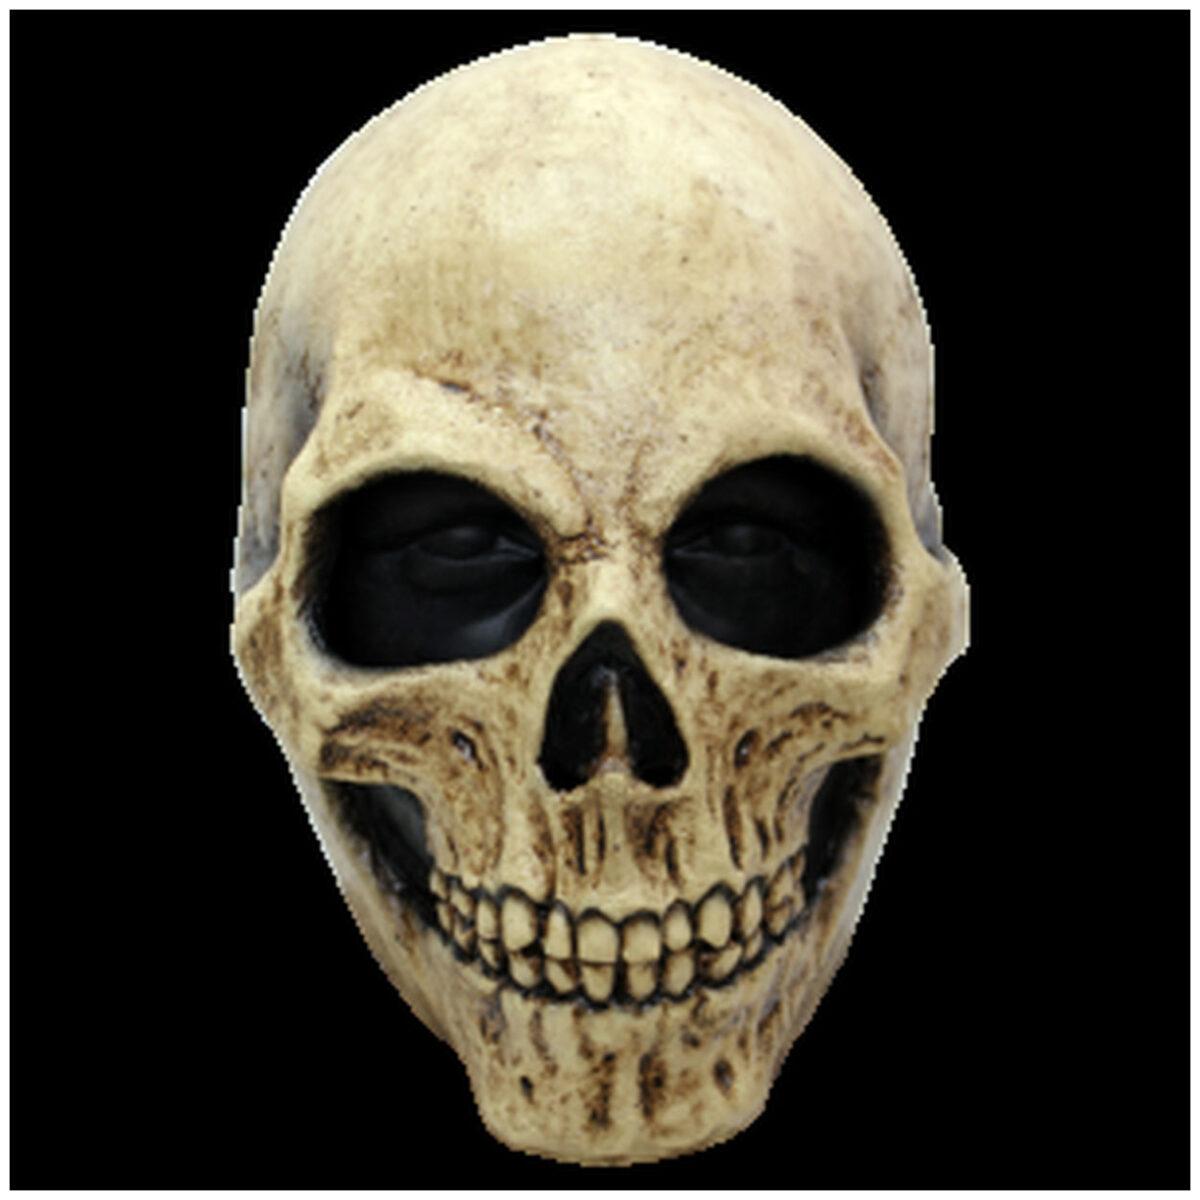 Bone-skull